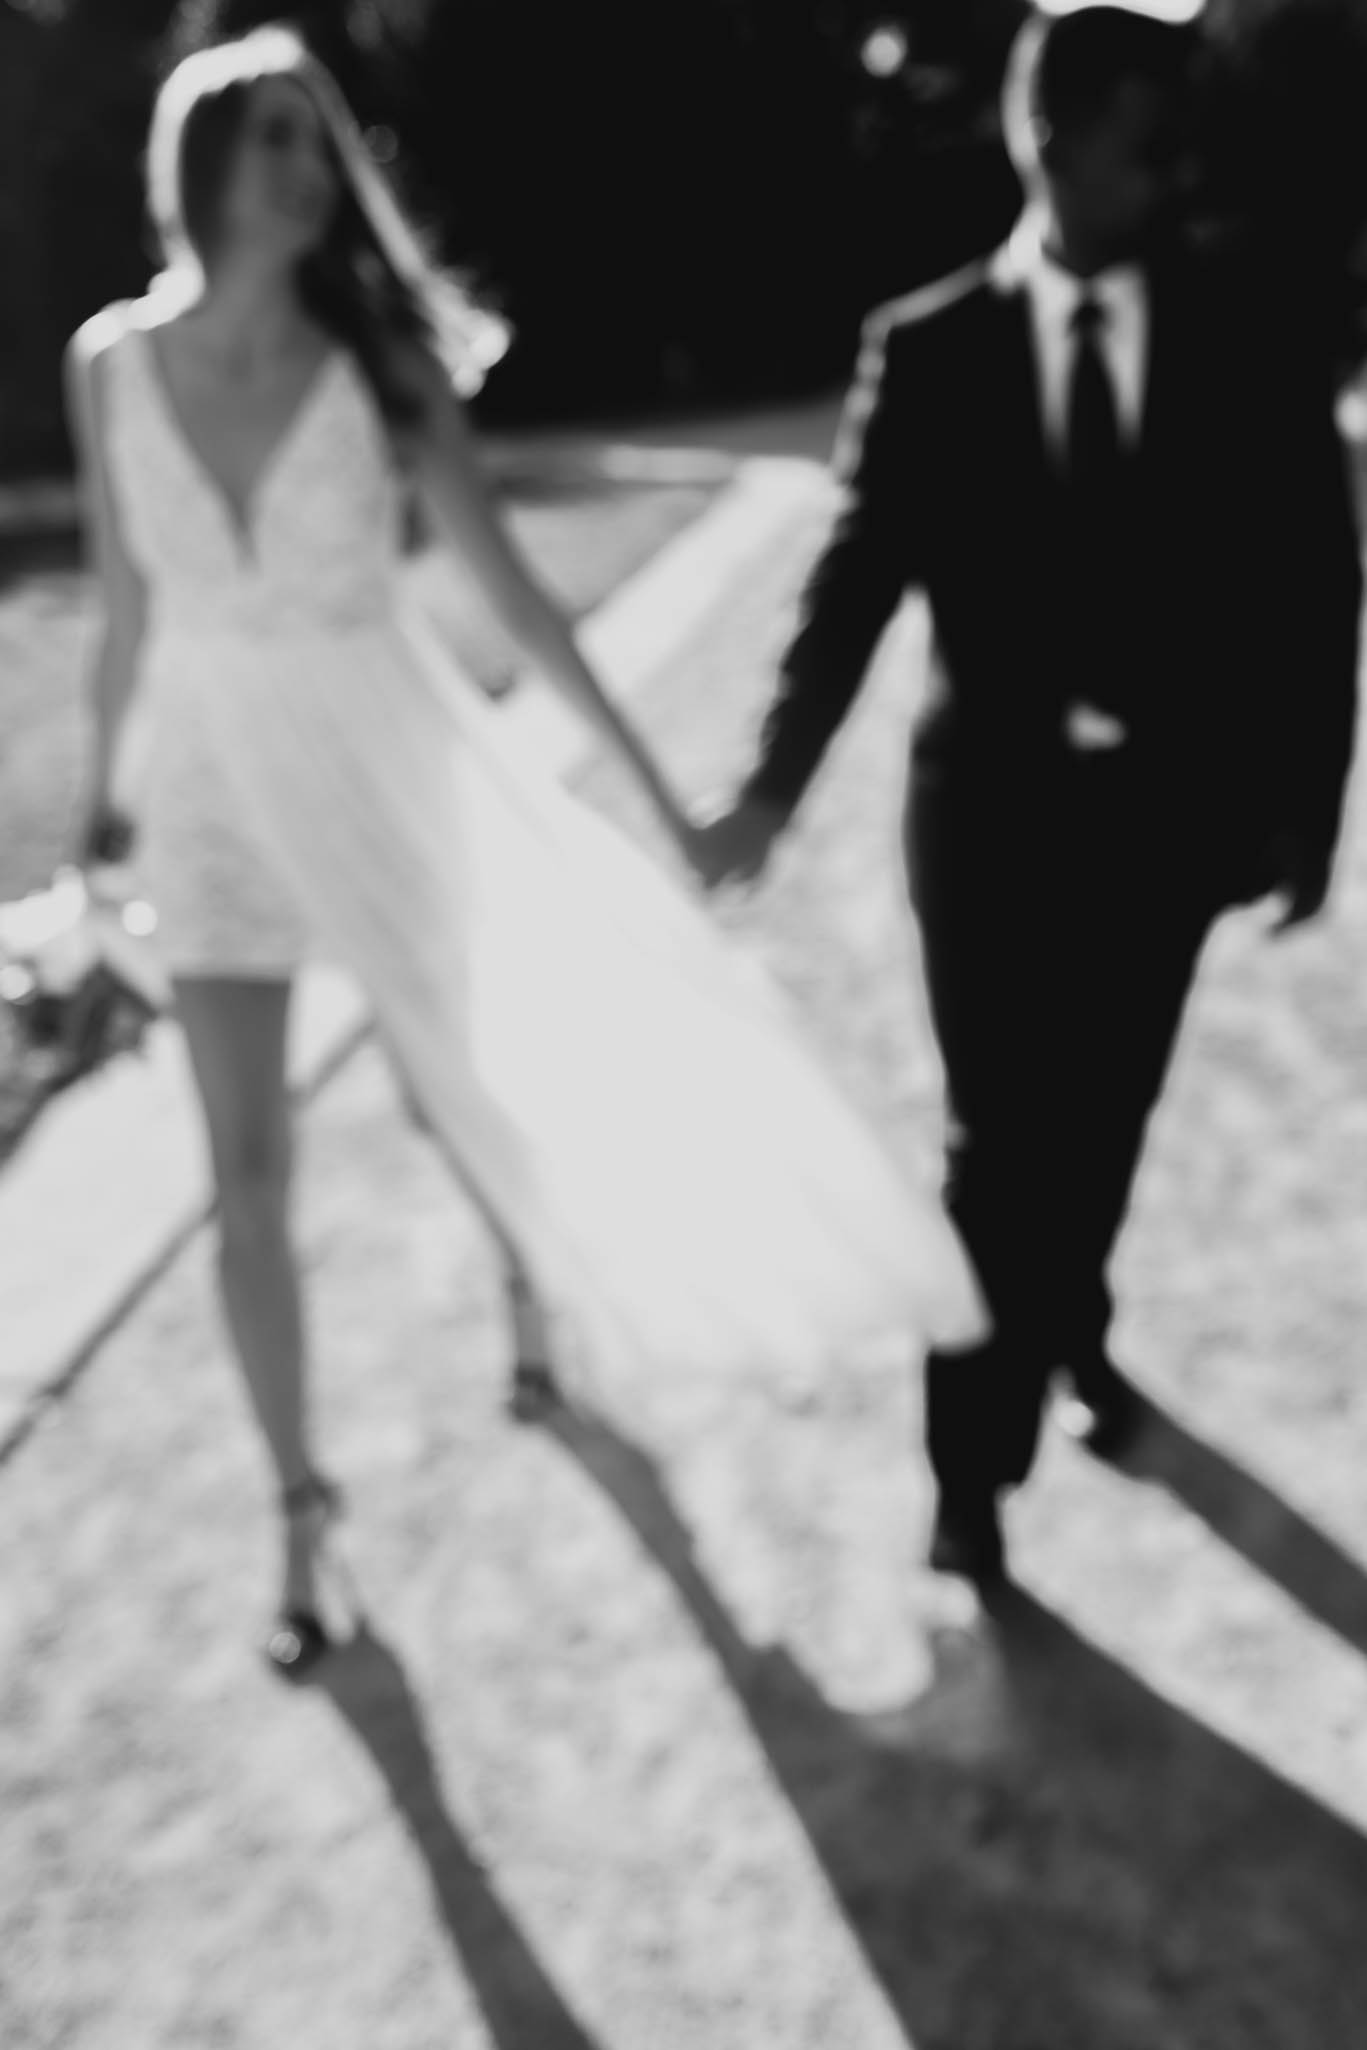 bride and groom walking through jc raulston arboretum in raleigh during their elopement